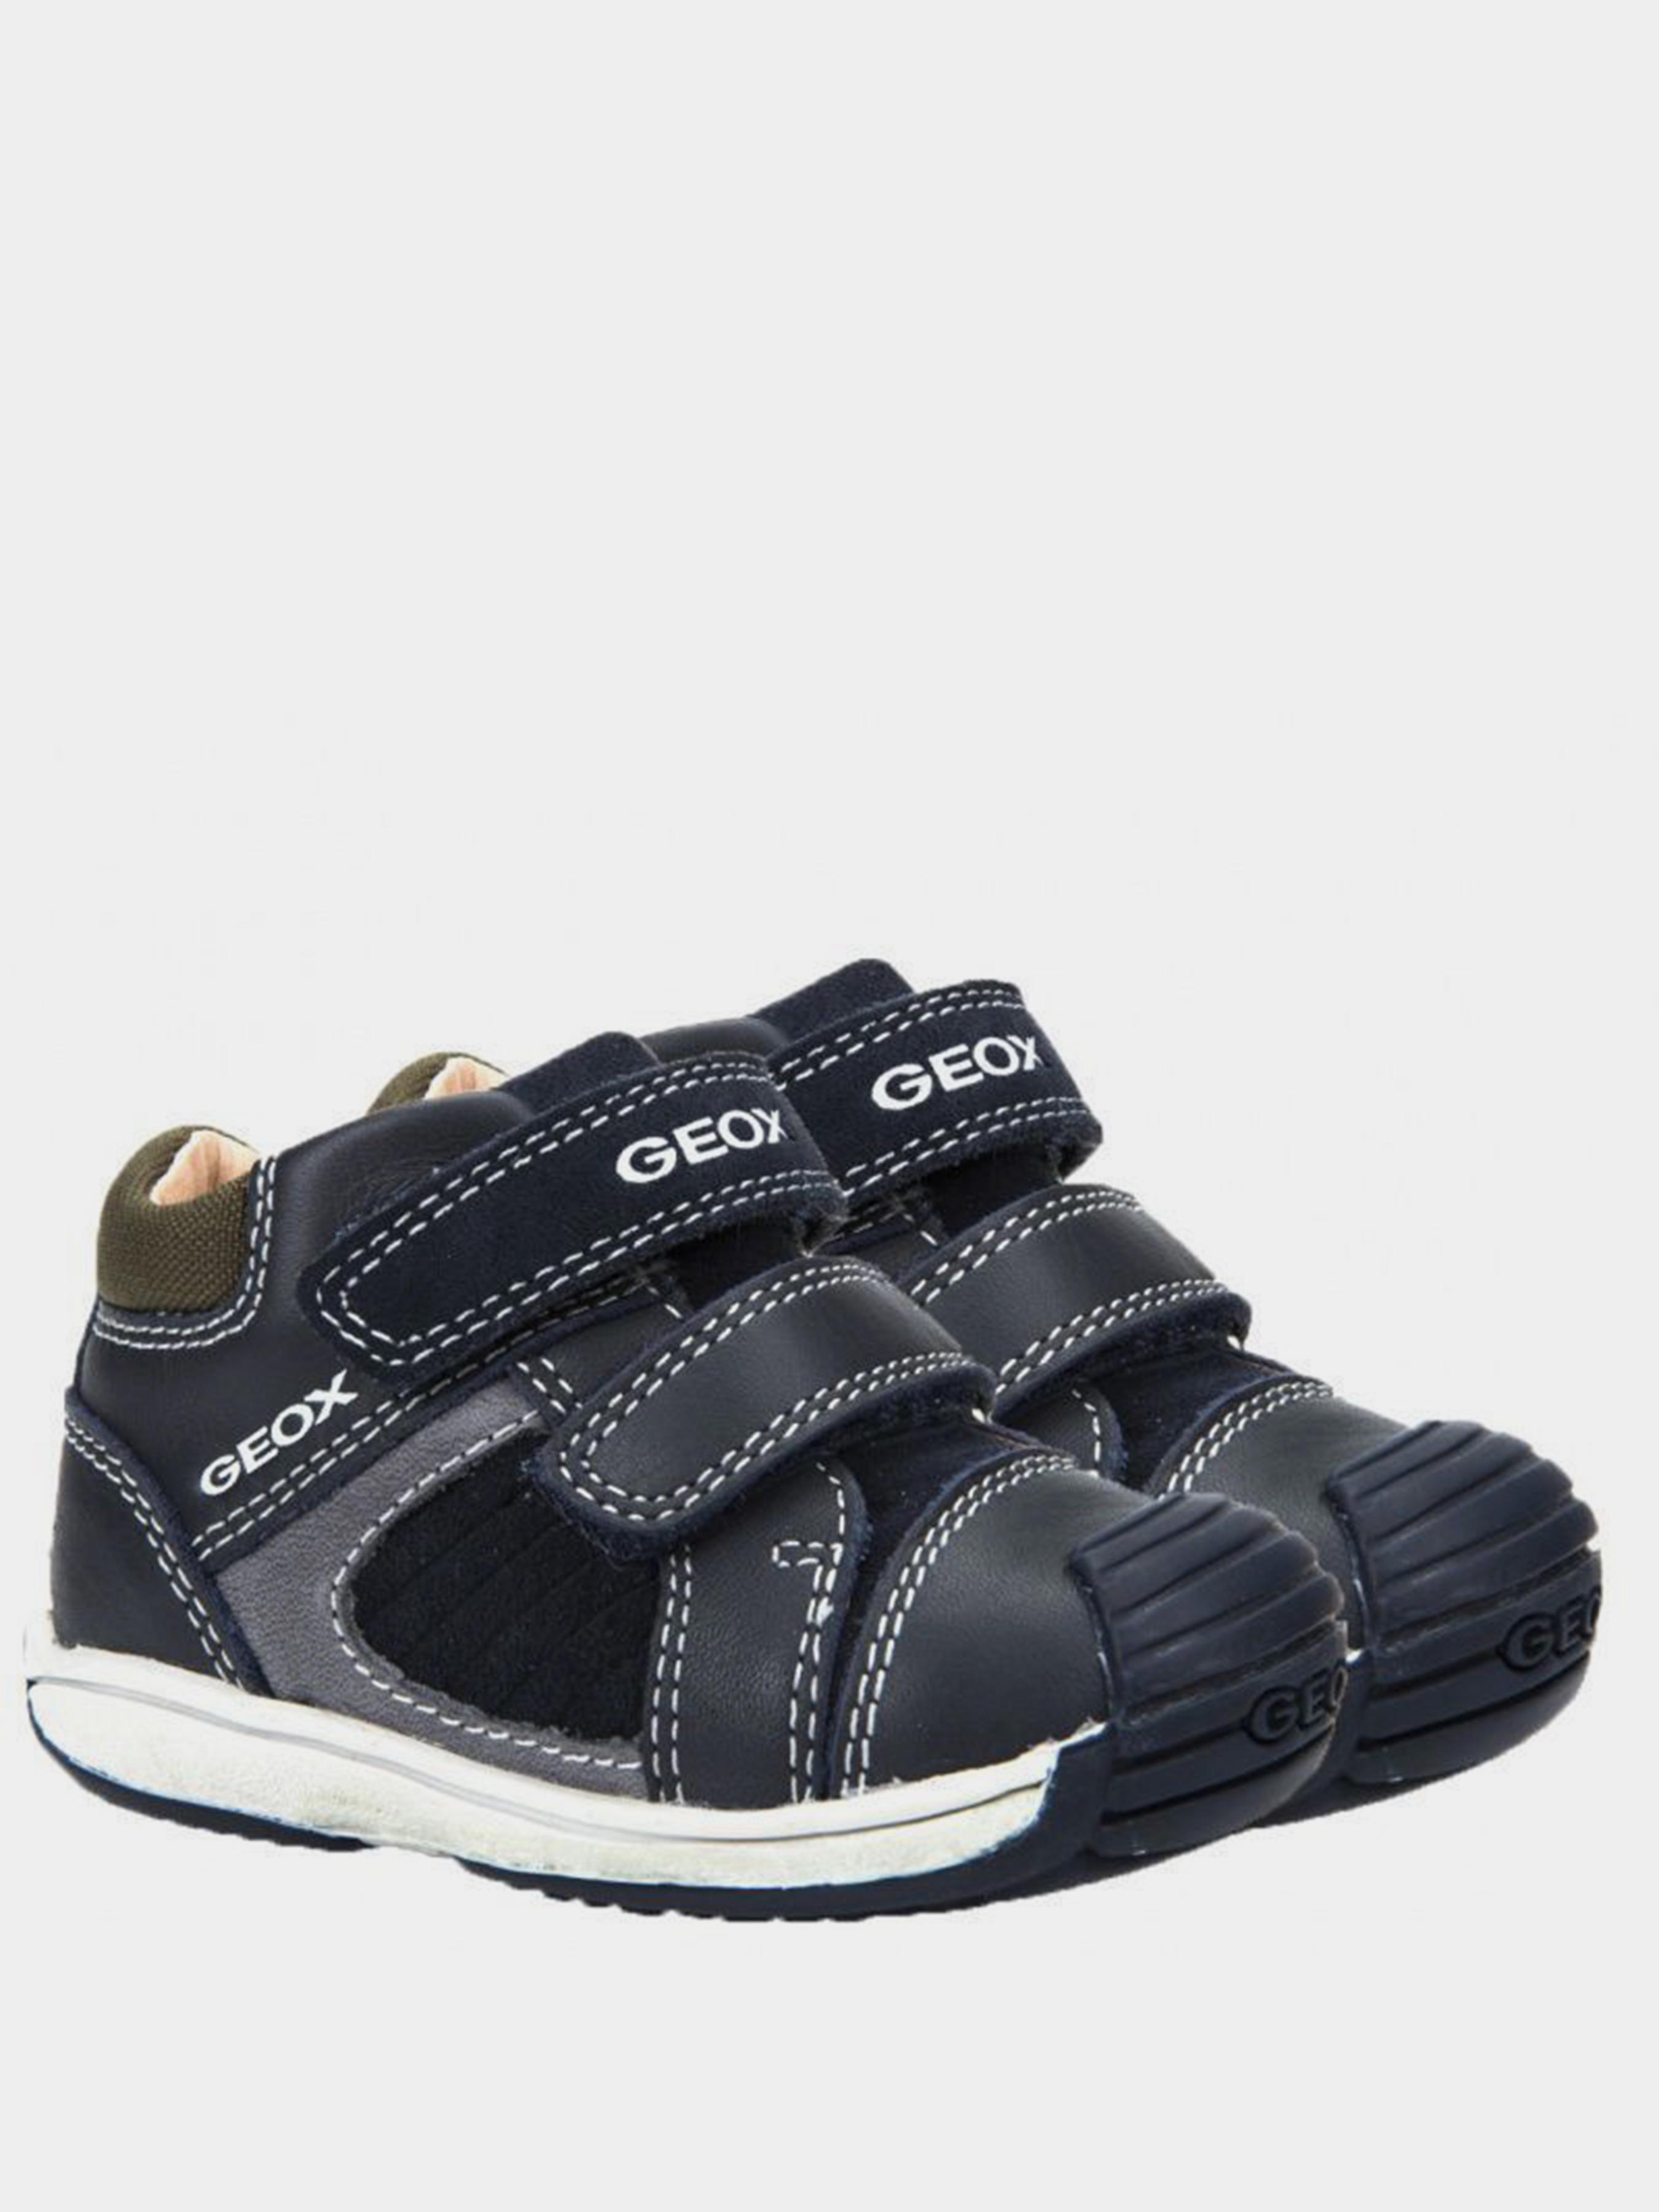 Ботинки для детей Geox B TOLEDO BOY XK5673 продажа, 2017